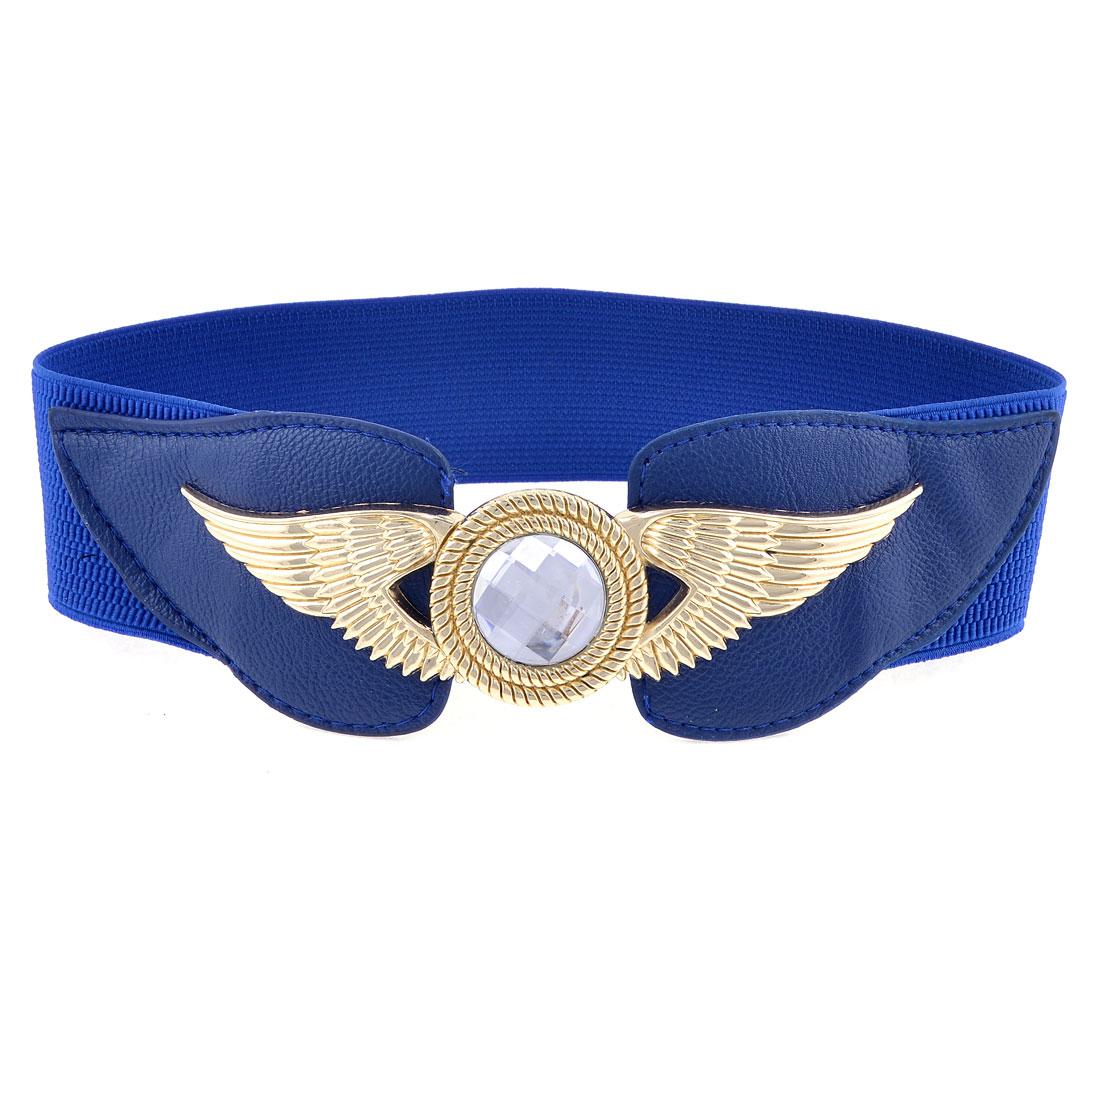 Gold Tone Metal Interlock Buckle 6cm Width Dark Blue Spandex Cinch Belt for Lady